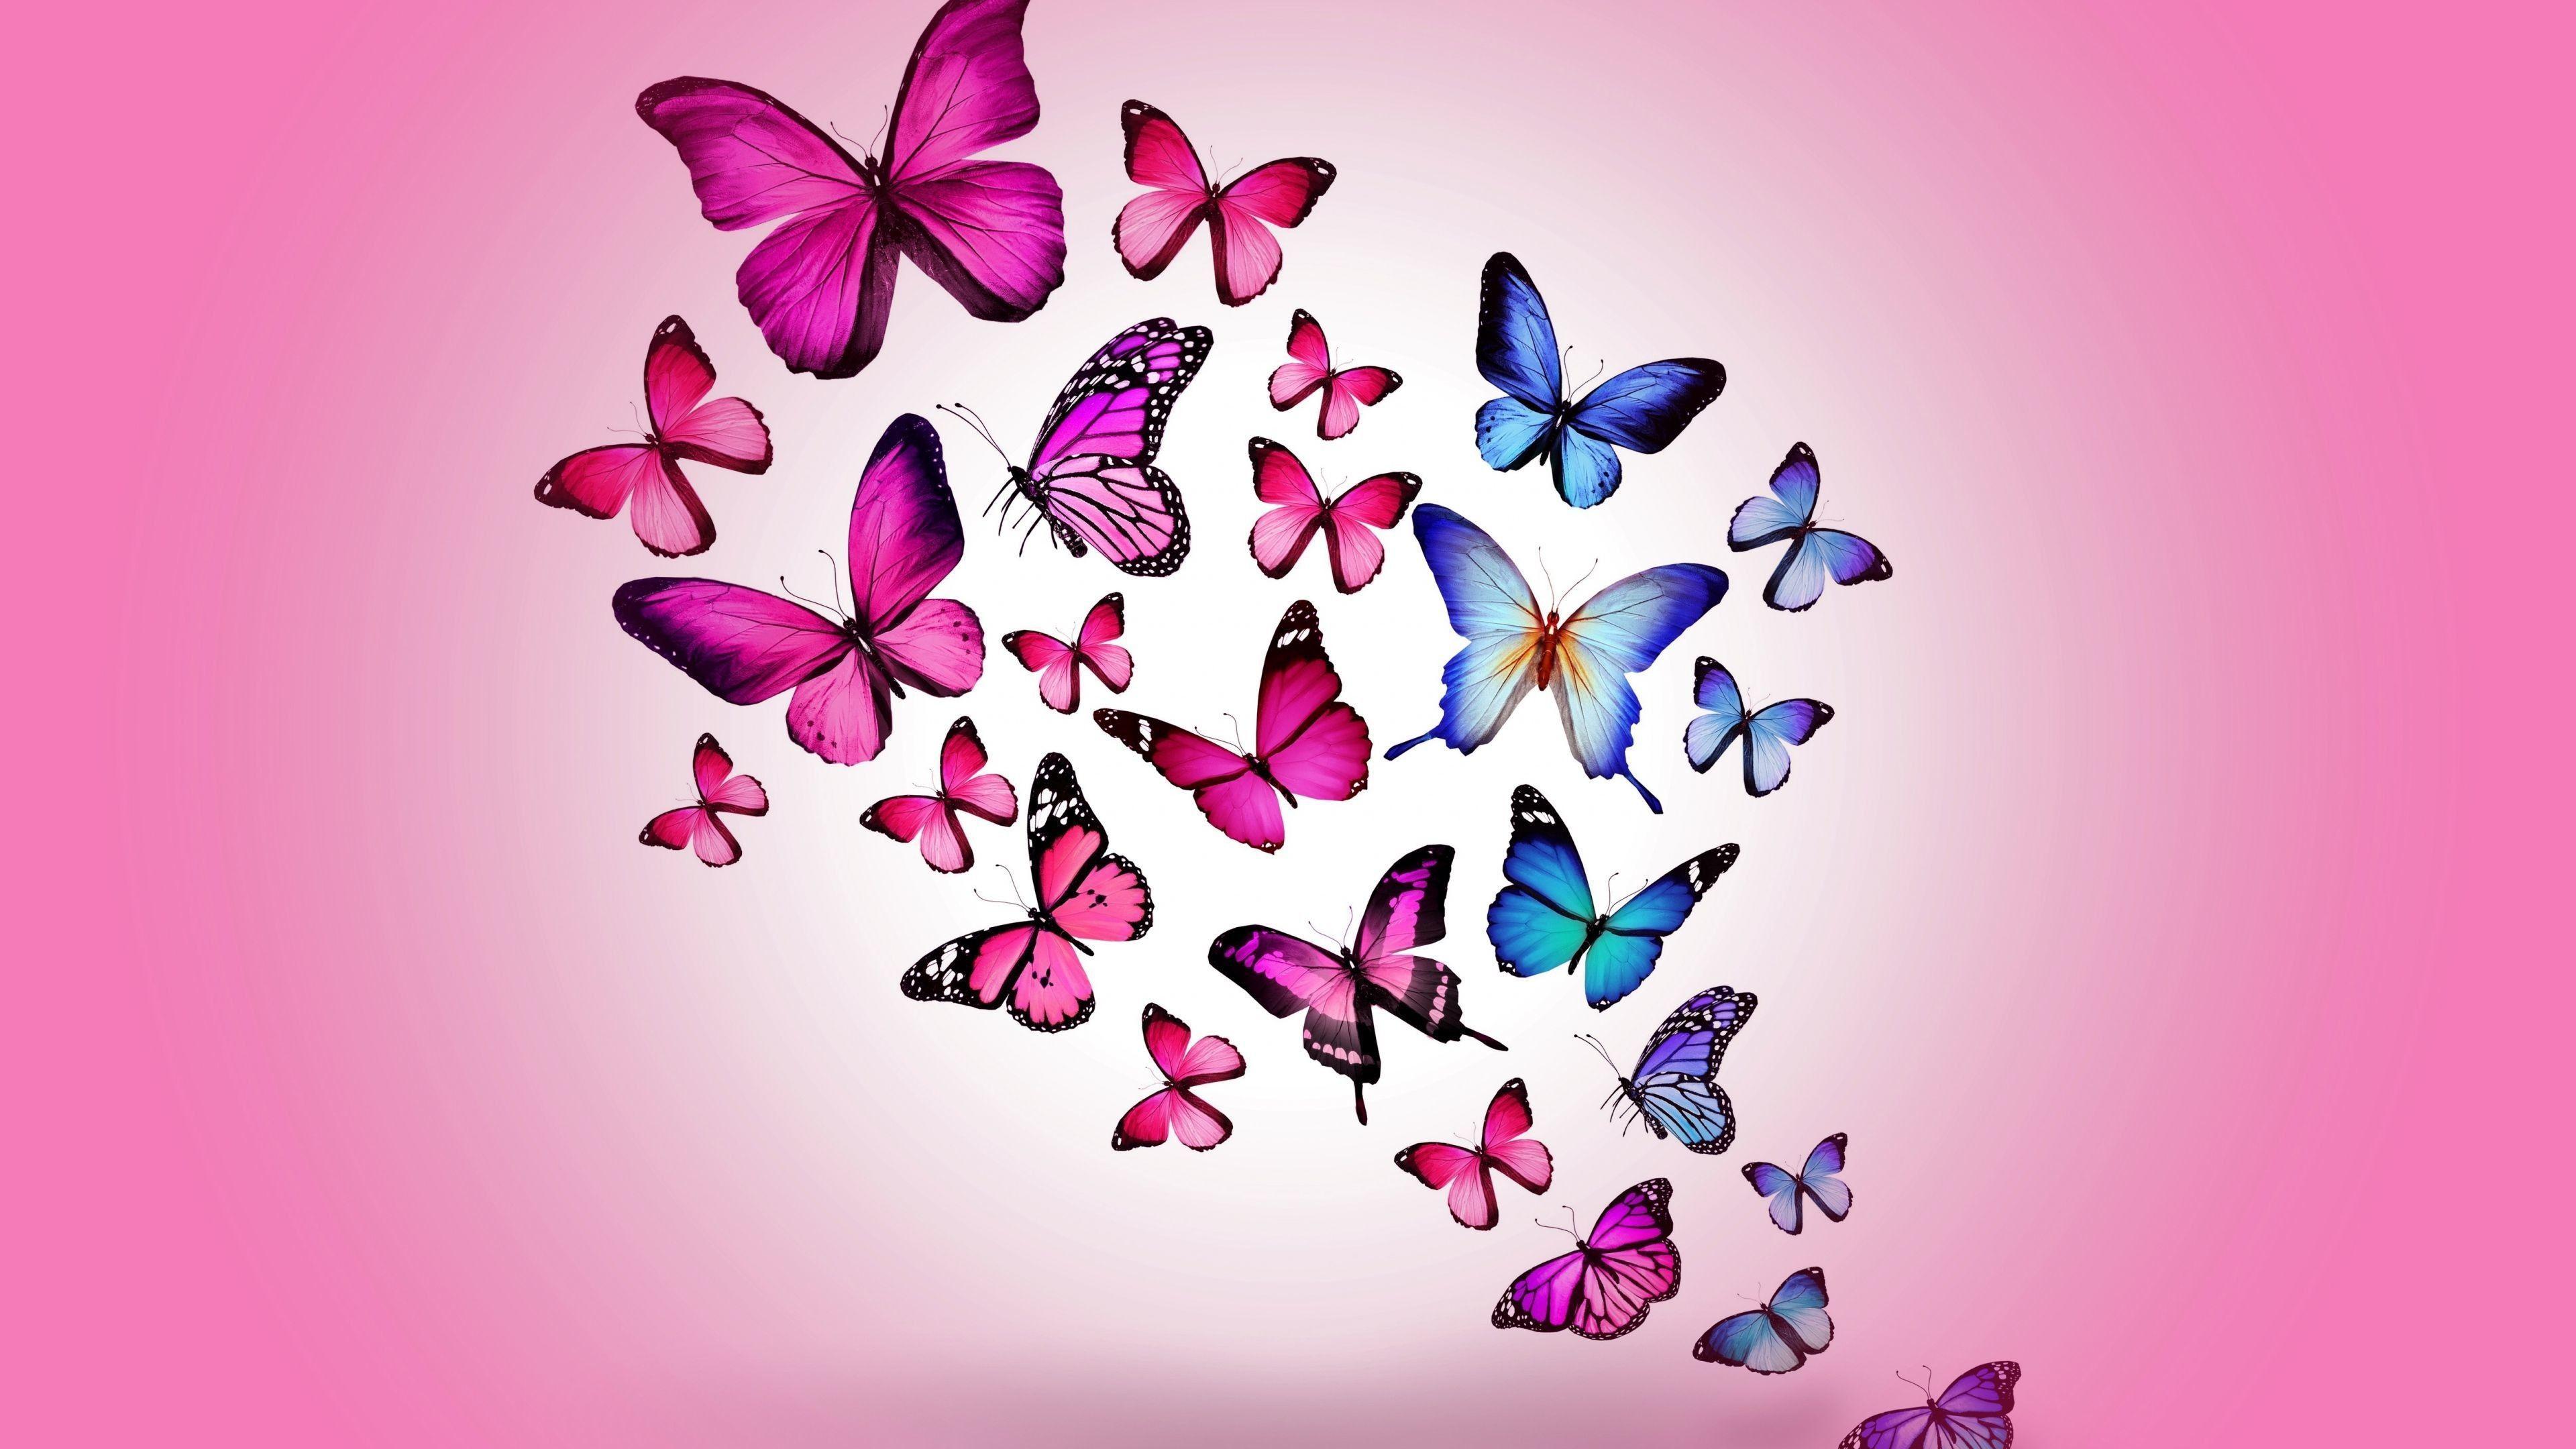 Pink Butterflies Wallpapers Top Free Pink Butterflies Backgrounds Wallpaperaccess pink butterflies wallpapers top free